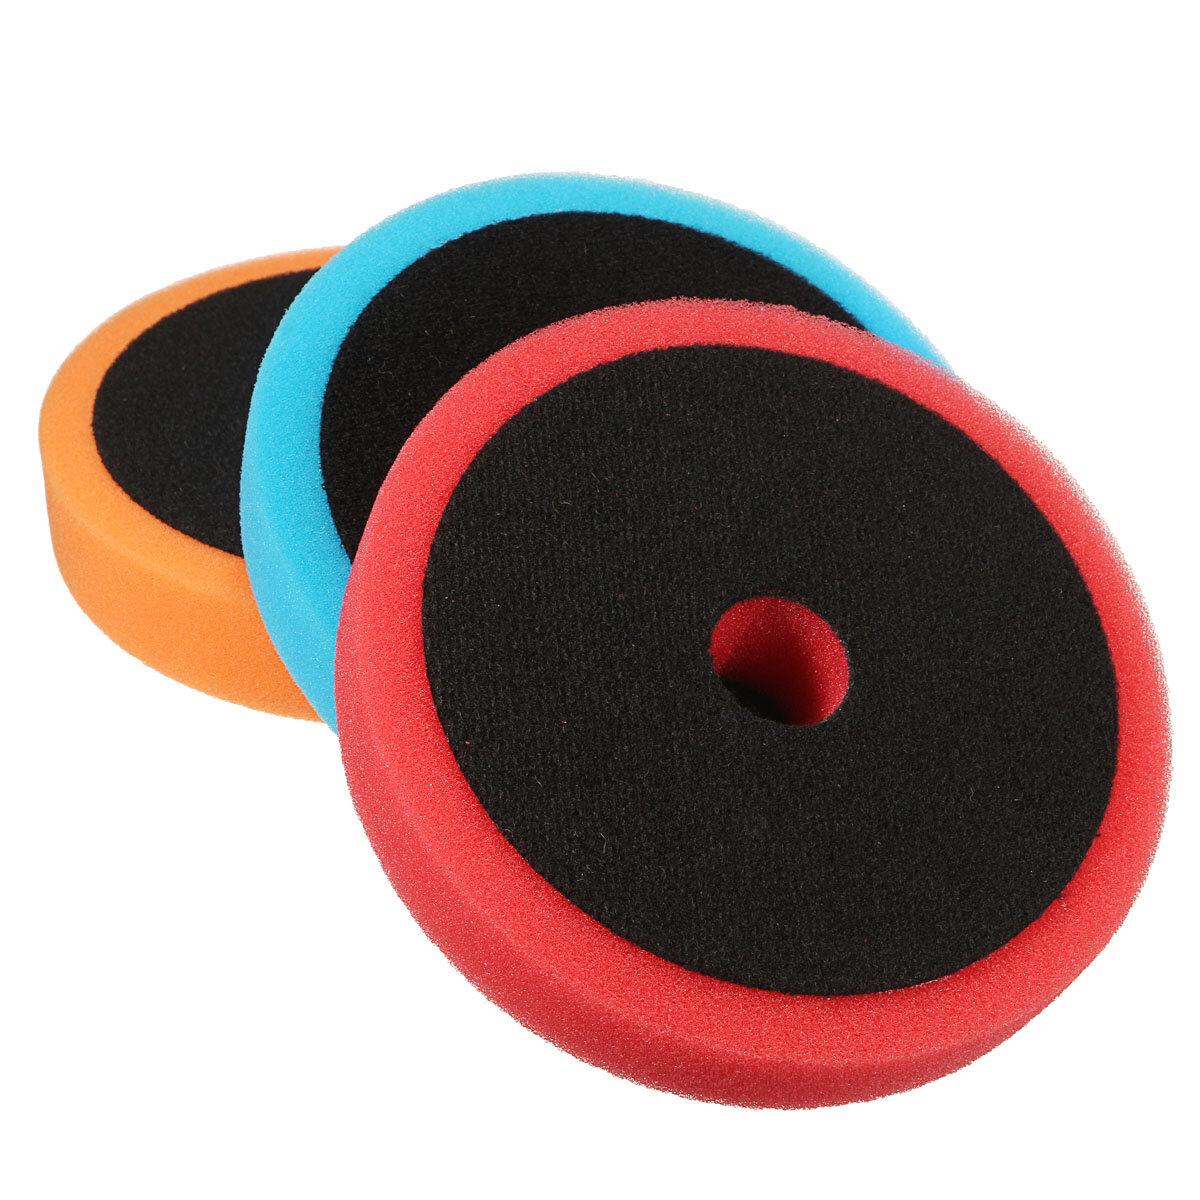 6 Inch 150mm Polishing Pad Buffing Pads Sponge For Car